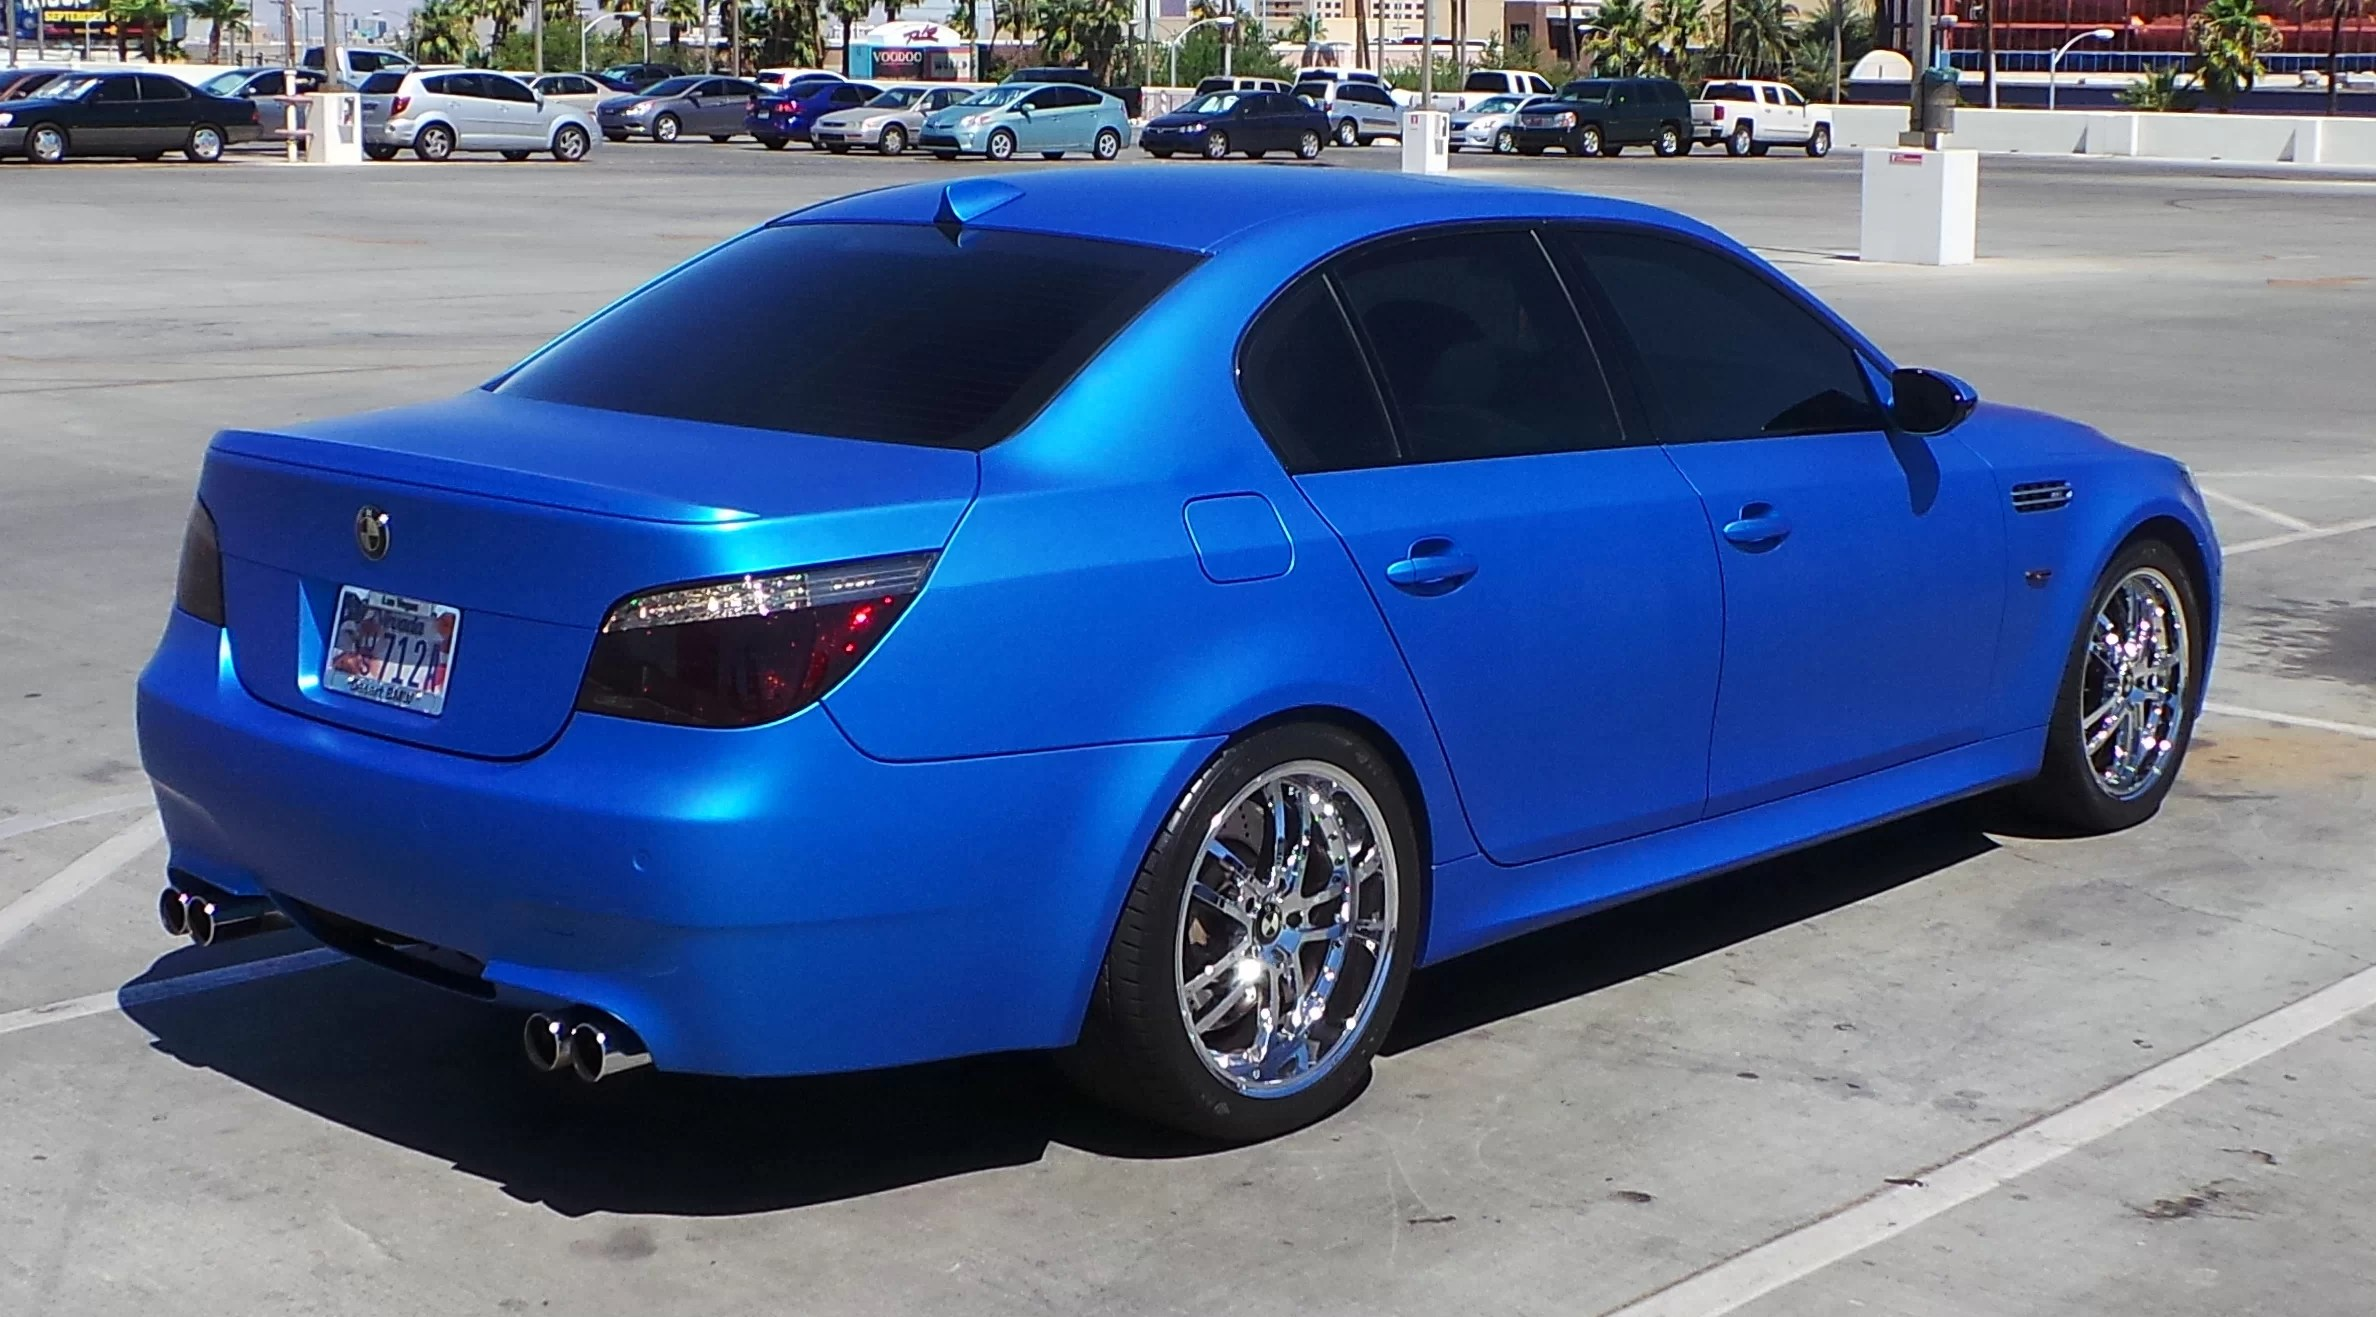 Blue Wrap Vinyl Electric Car